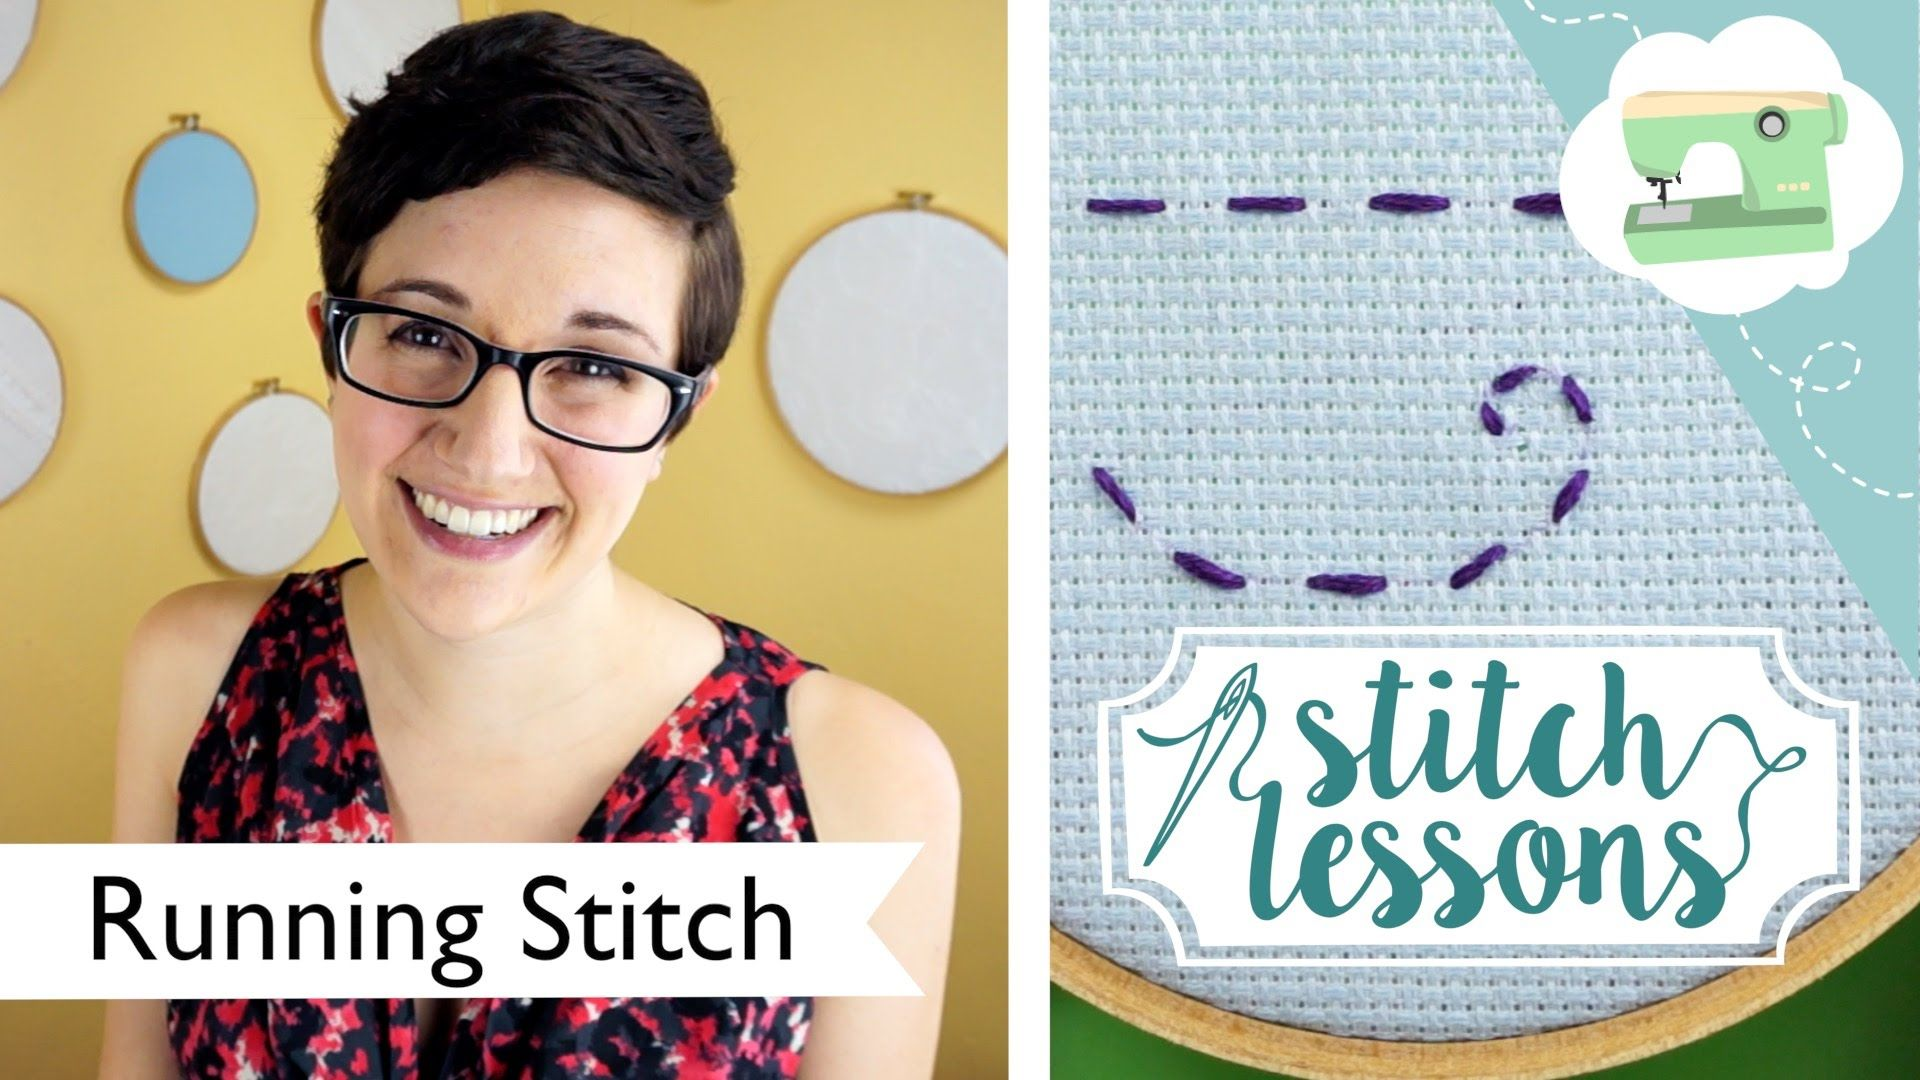 Sewing Running Stitch Stitch Lessons